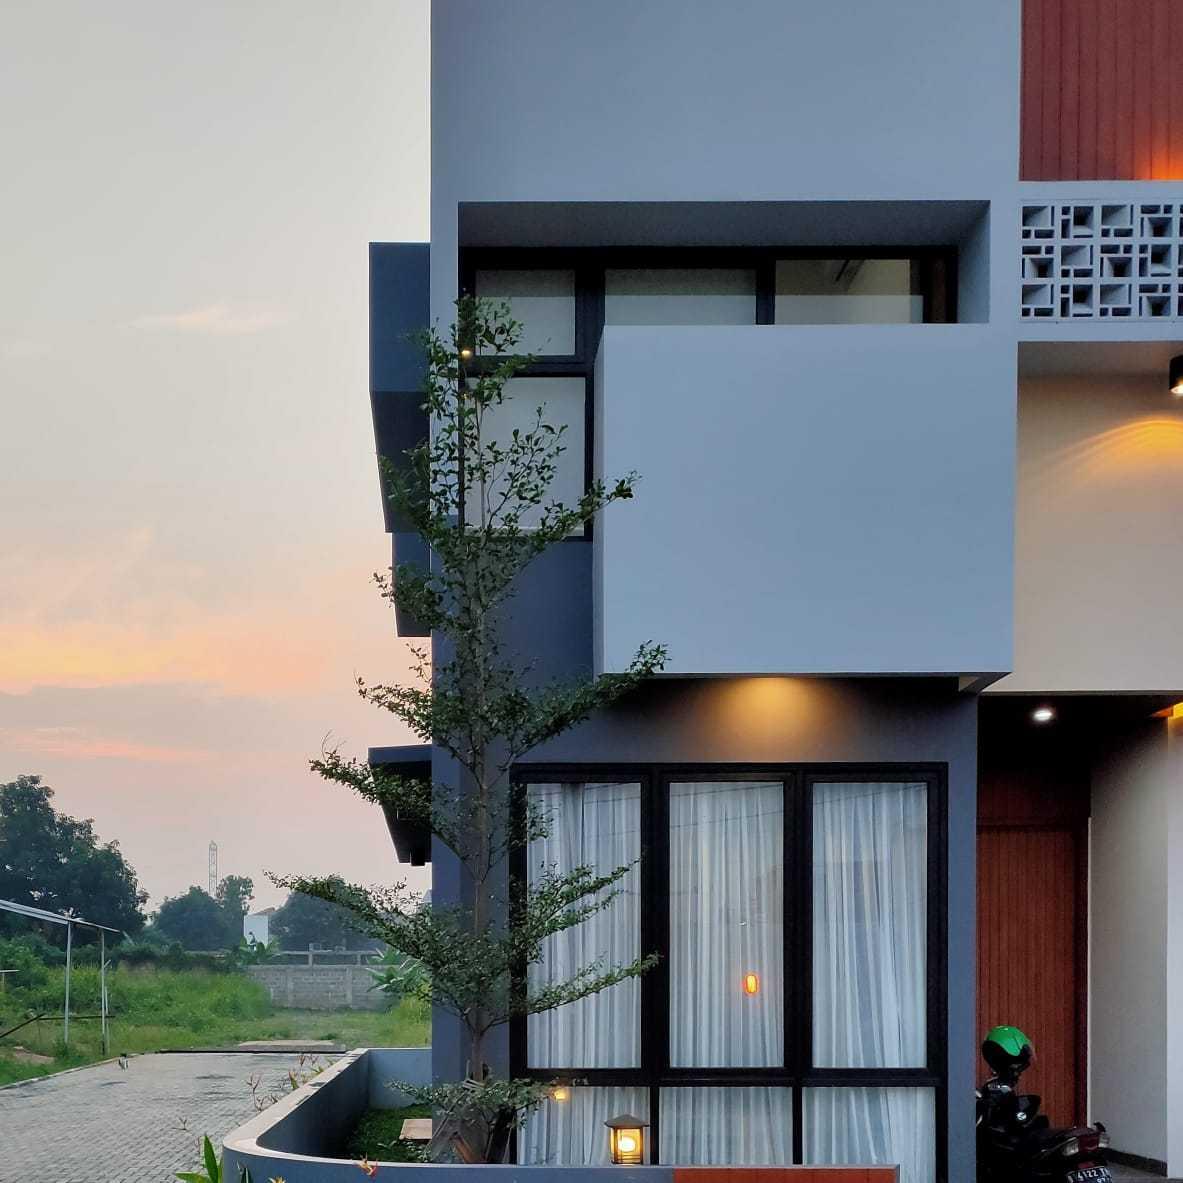 Arbatra Design Balboa Estate Bintaro Pd. Pucung, Kec. Pd. Aren, Kota Tangerang Selatan, Banten 15229, Indonesia Pd. Pucung, Kec. Pd. Aren, Kota Tangerang Selatan, Banten 15229, Indonesia Arbatra-Design-Balboa-Estate-Bintaro  121228